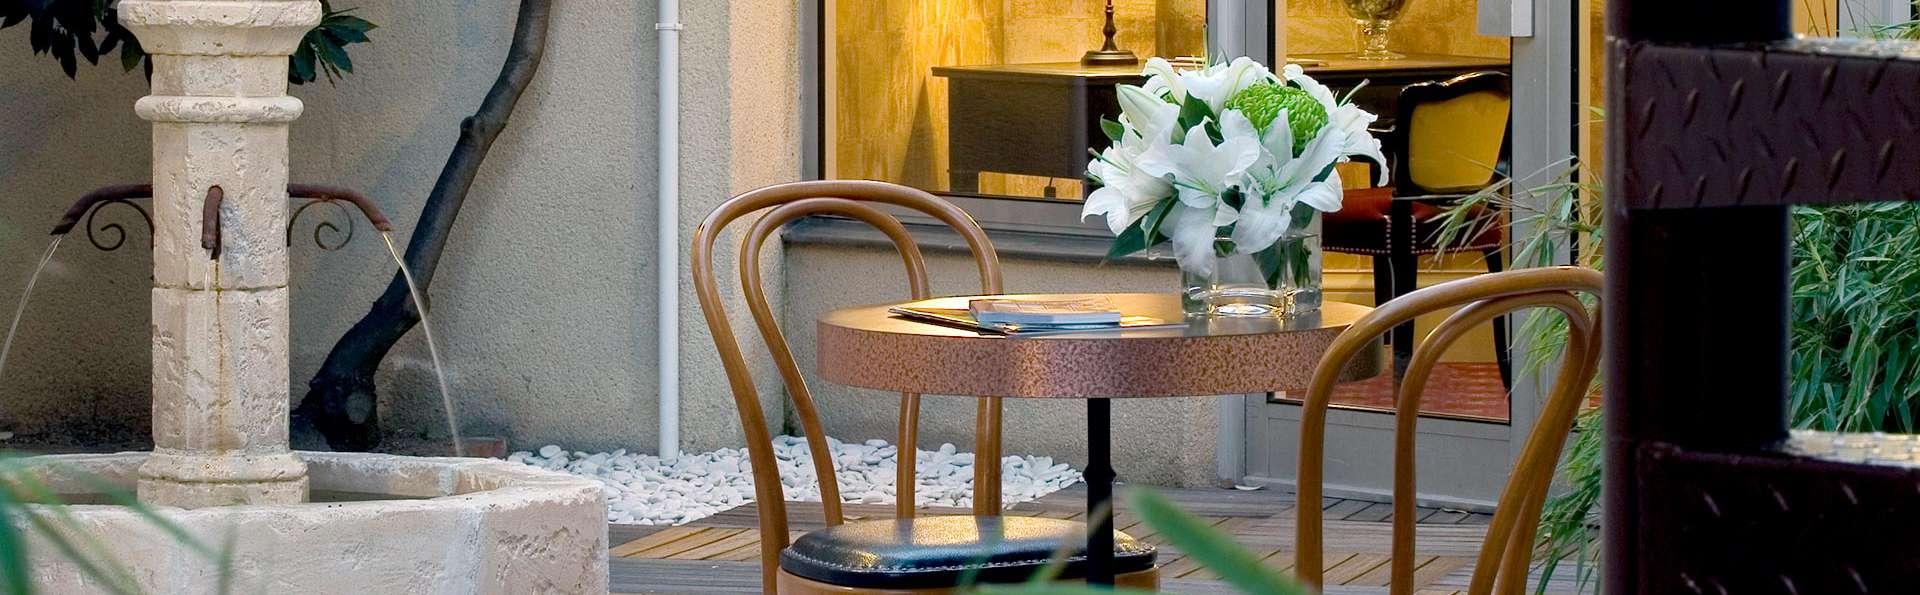 Brit Hôtel Le Clos Saint Martin - EDIT_N2_TERRACE.jpg